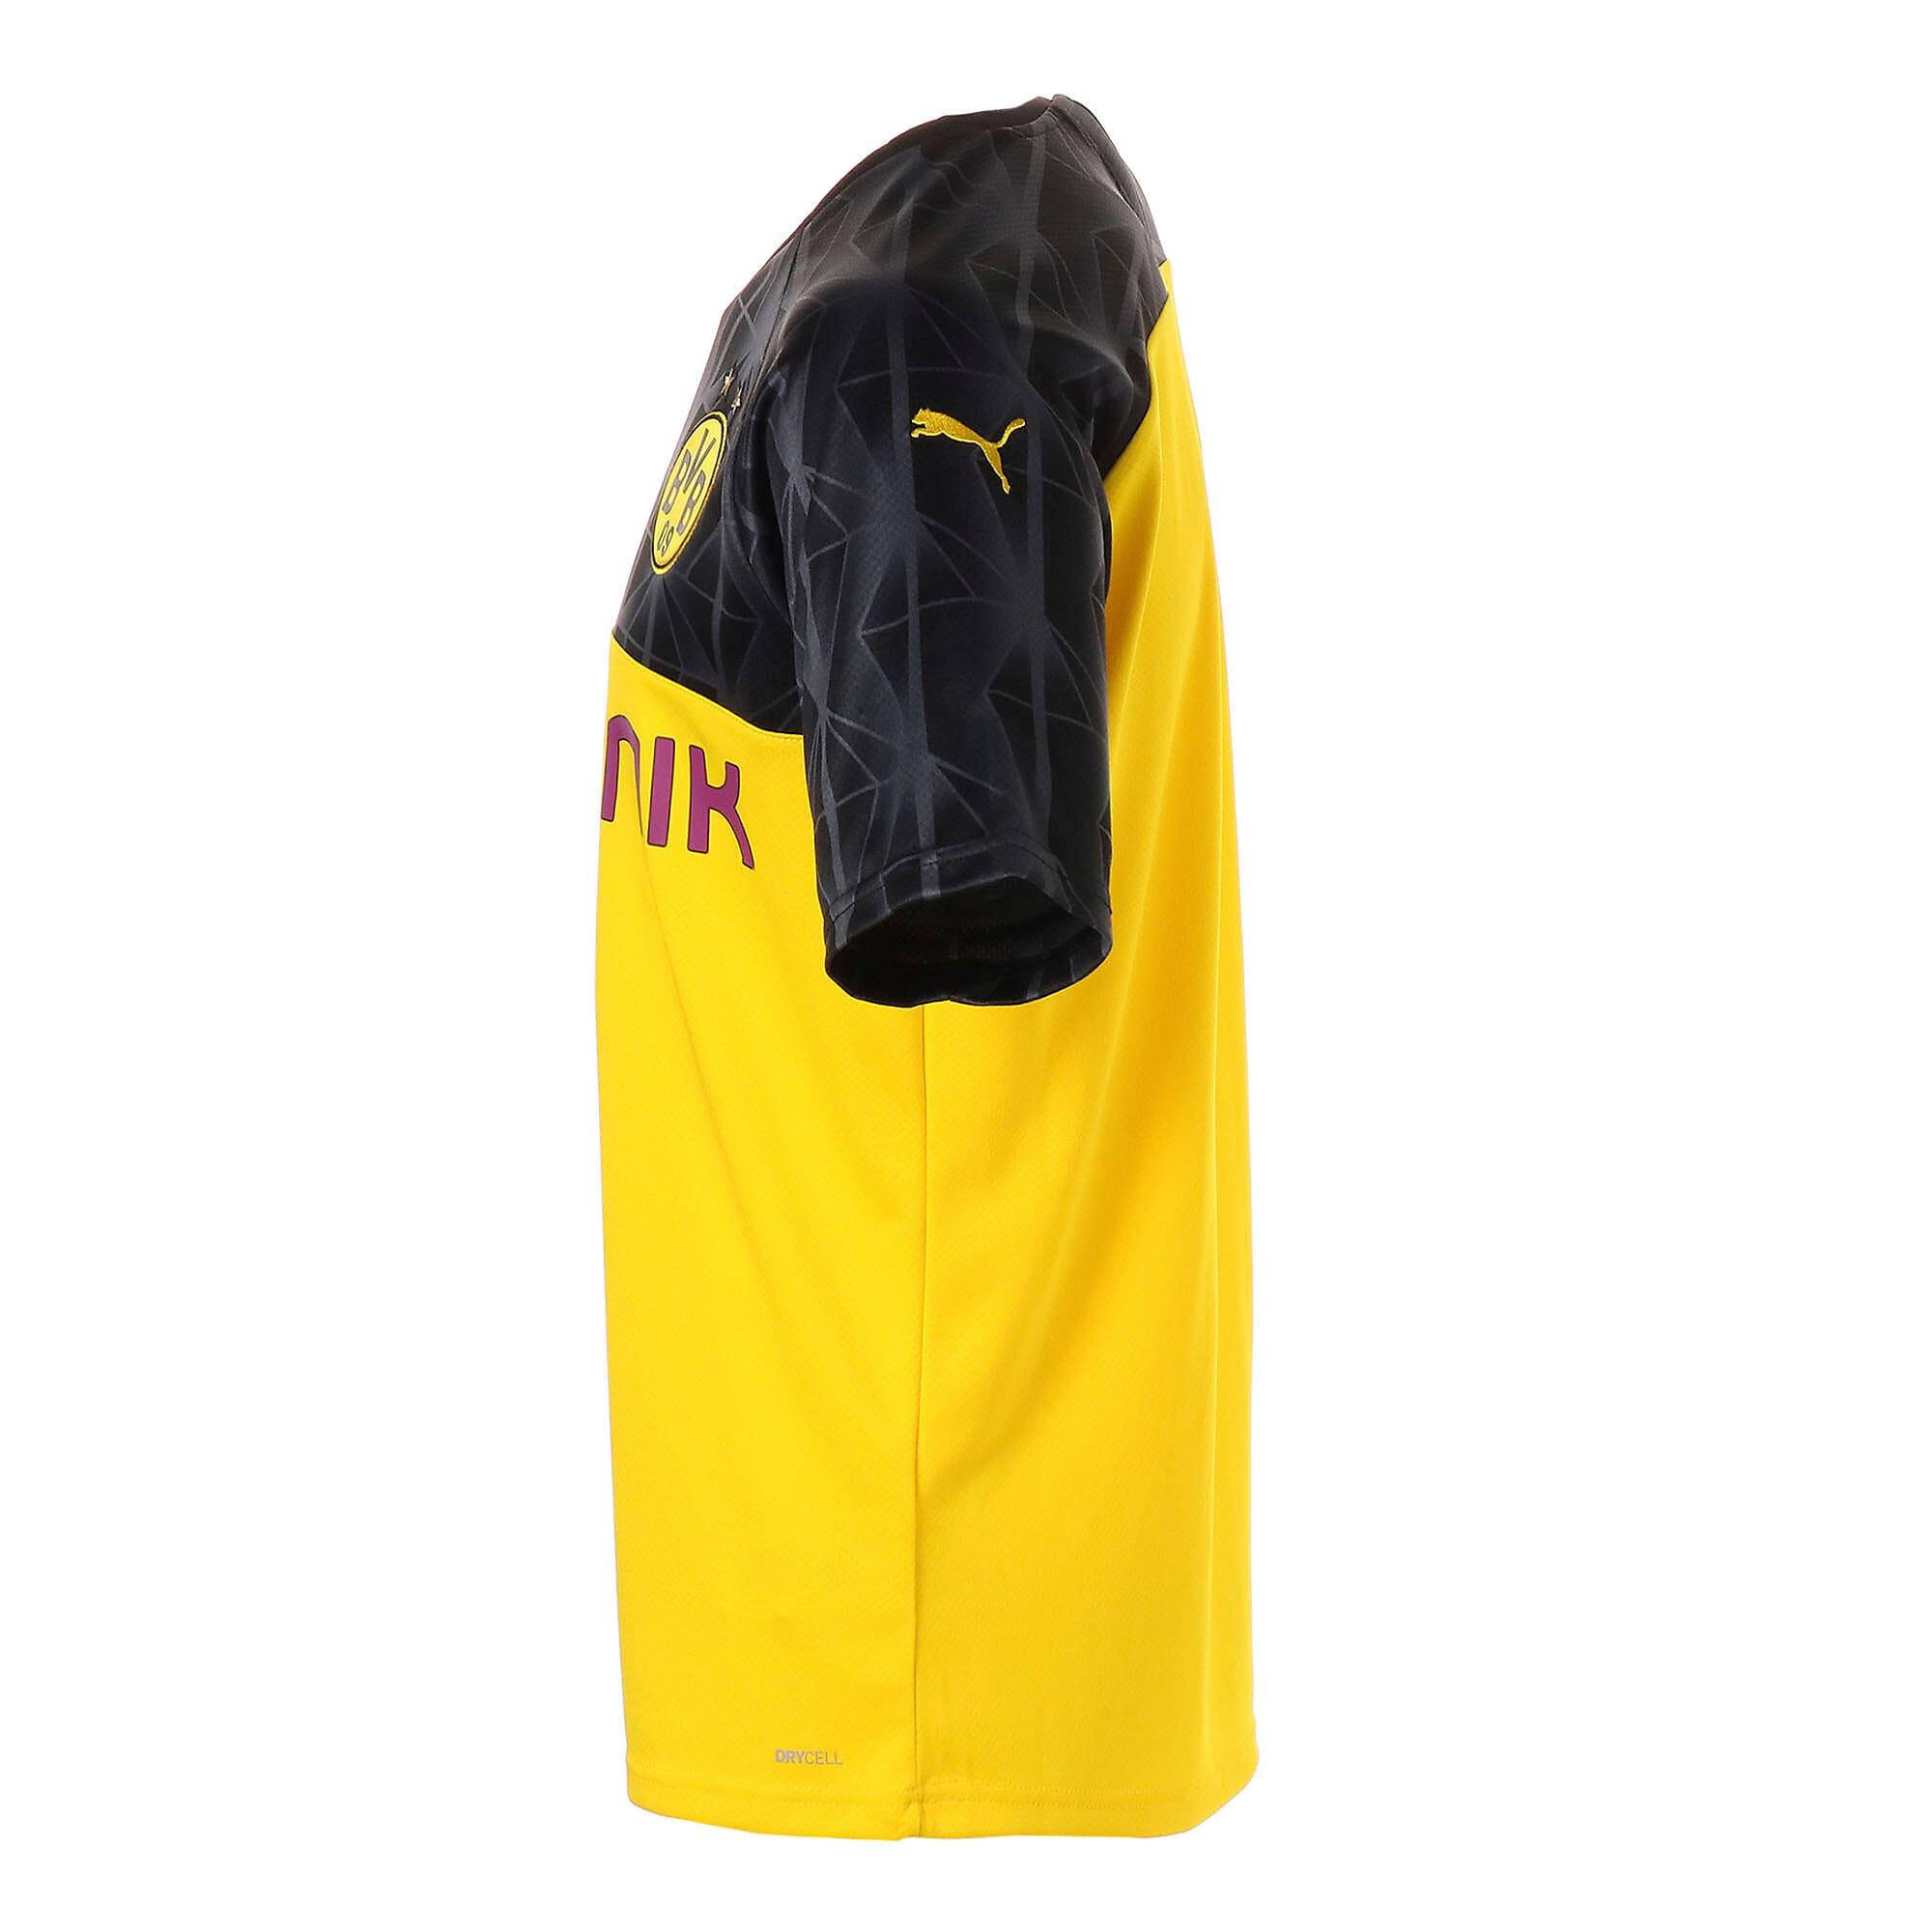 Thumbnail 2 of ドルトムント BVB SS カップ レプリカシャツ (半袖), Cyber Yellow-Puma Black, medium-JPN